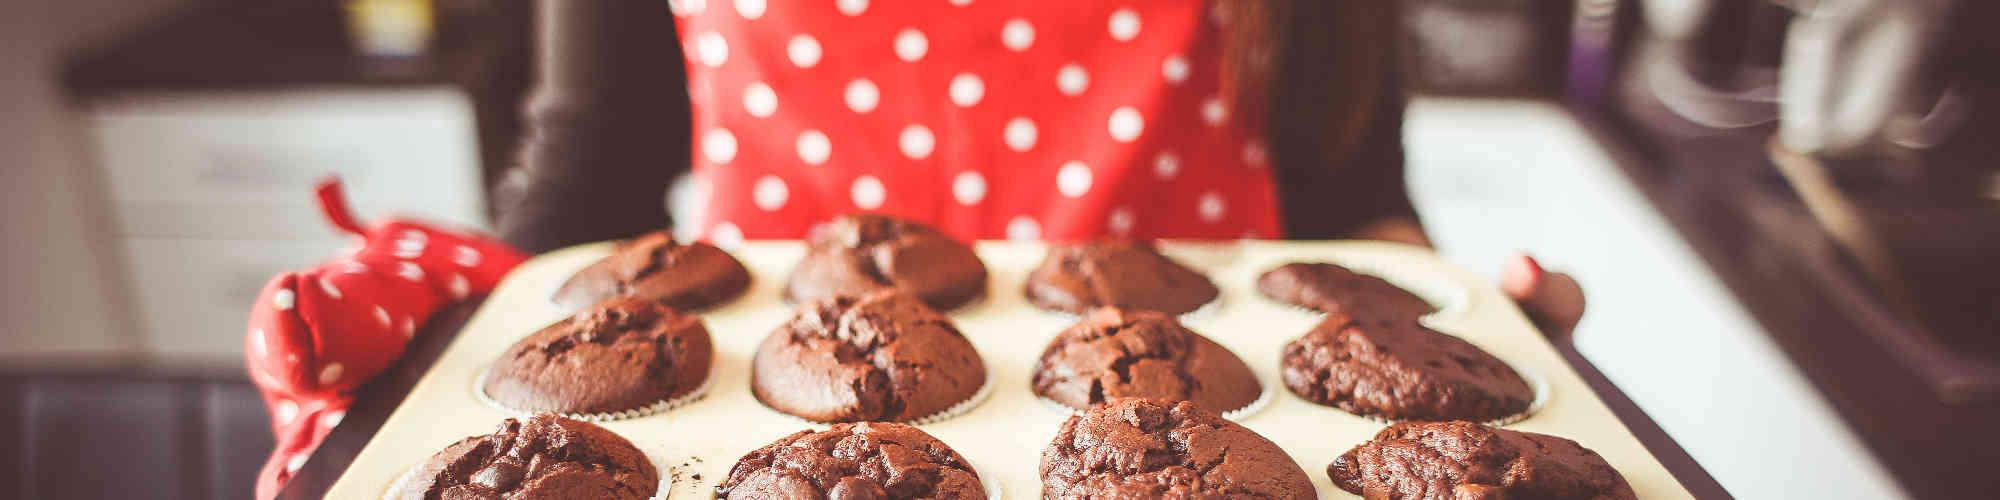 https://s3.amazonaws.com/ka-images-prod/mastheads/showing-muffins.jpg